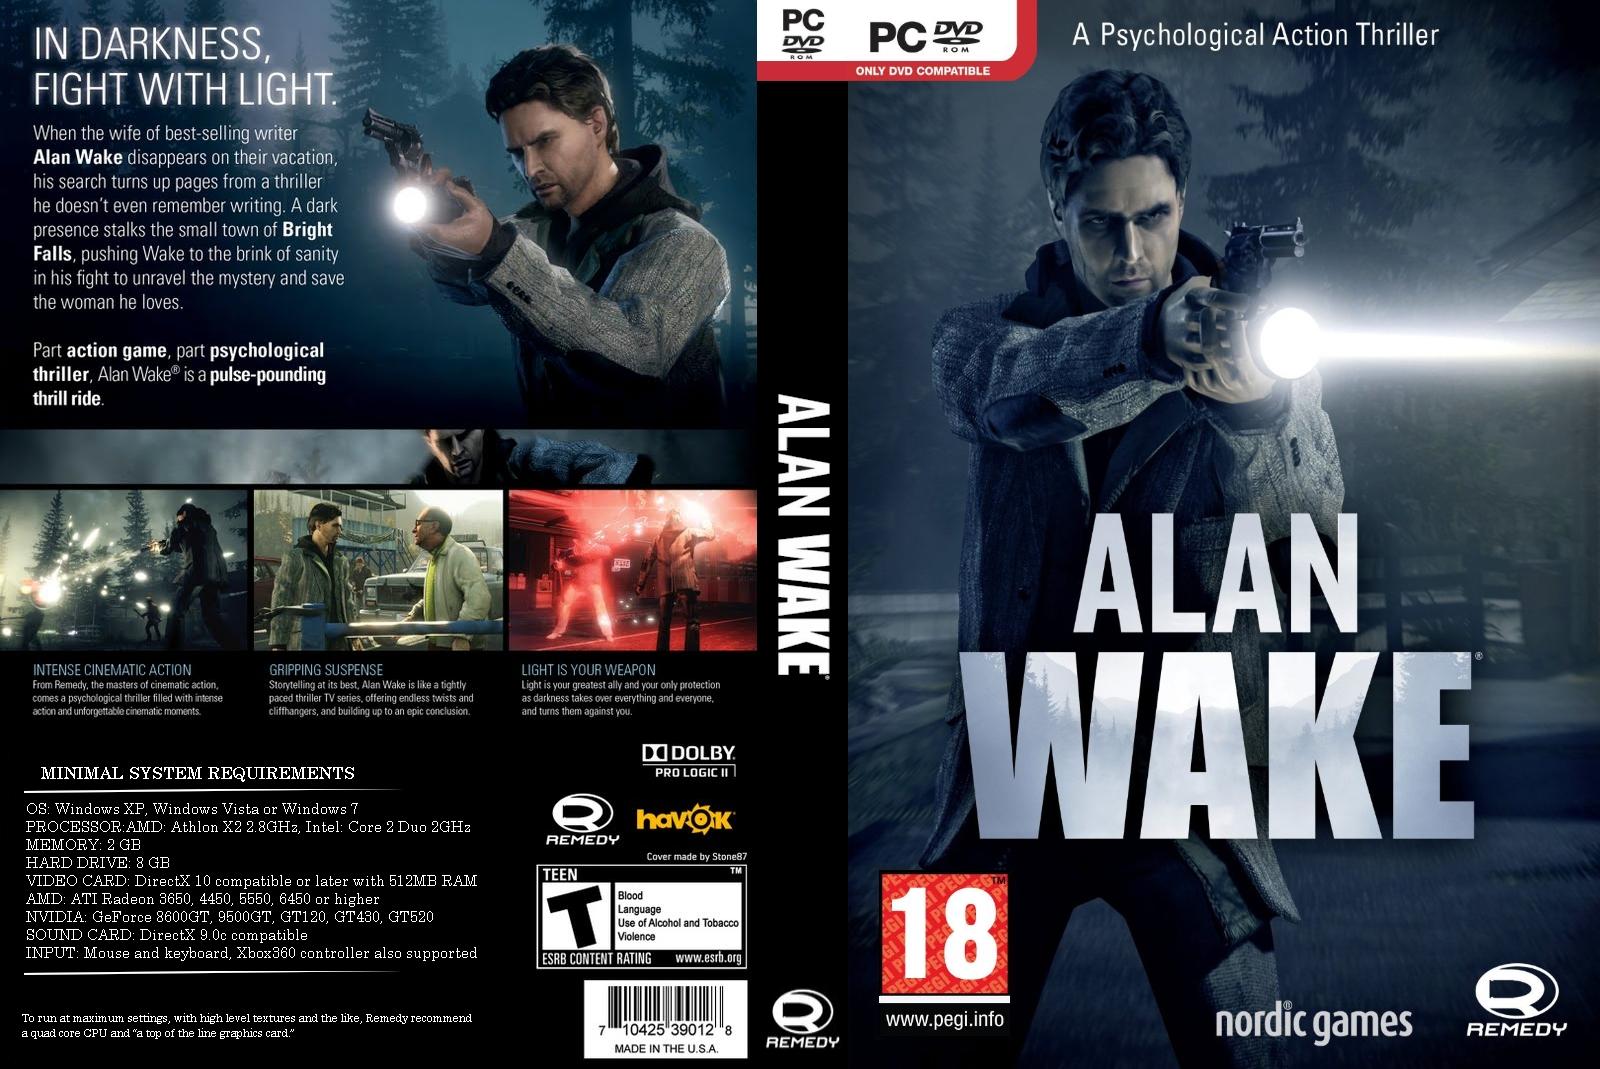 [IMG]http://3.bp.blogspot.com/-YlKij1Bi_kY/UjVdtpOgu9I/AAAAAAAAAZo/NCK-aSEzILQ/s1600/alan_wake_pc_cover_by_eximmice-d4zxuou.jpg[/IMG]